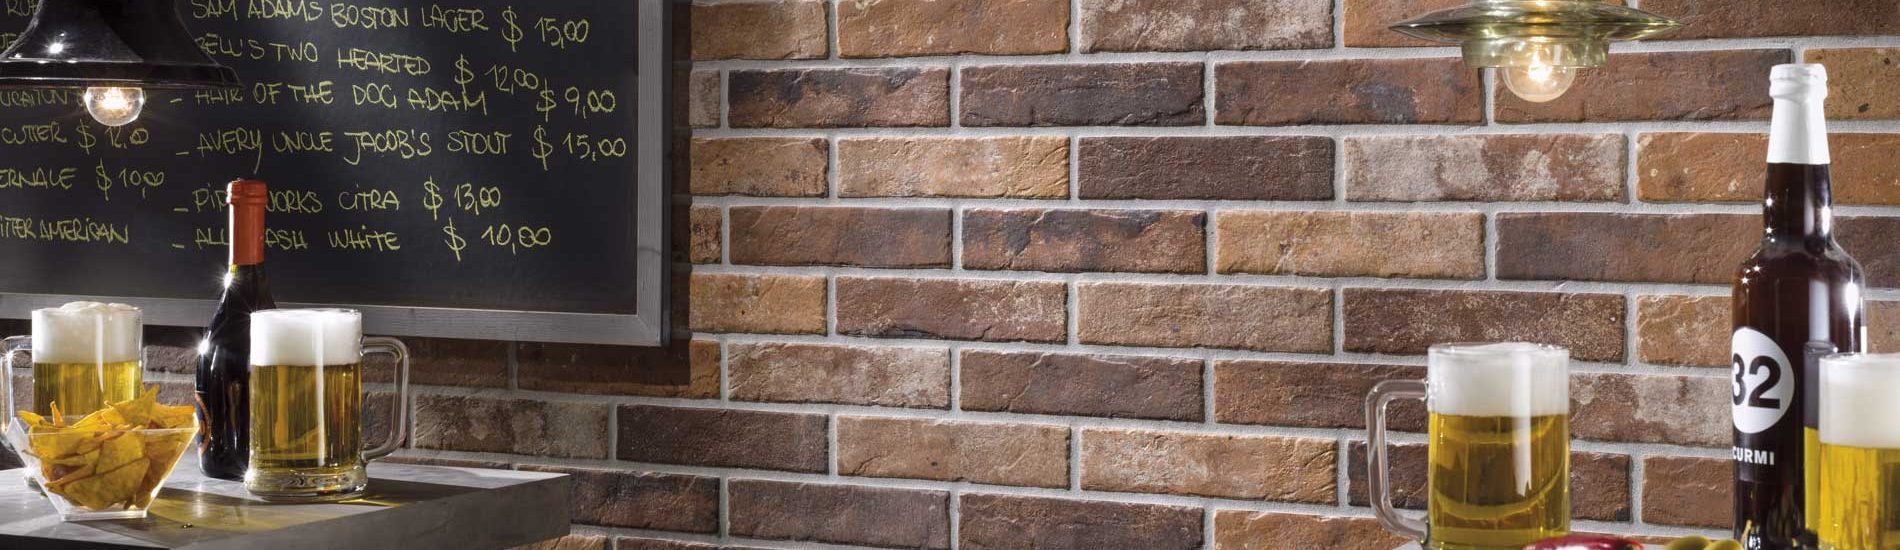 banner-tribeca-italian-brick-look-wall-tile-ceramica-rondine